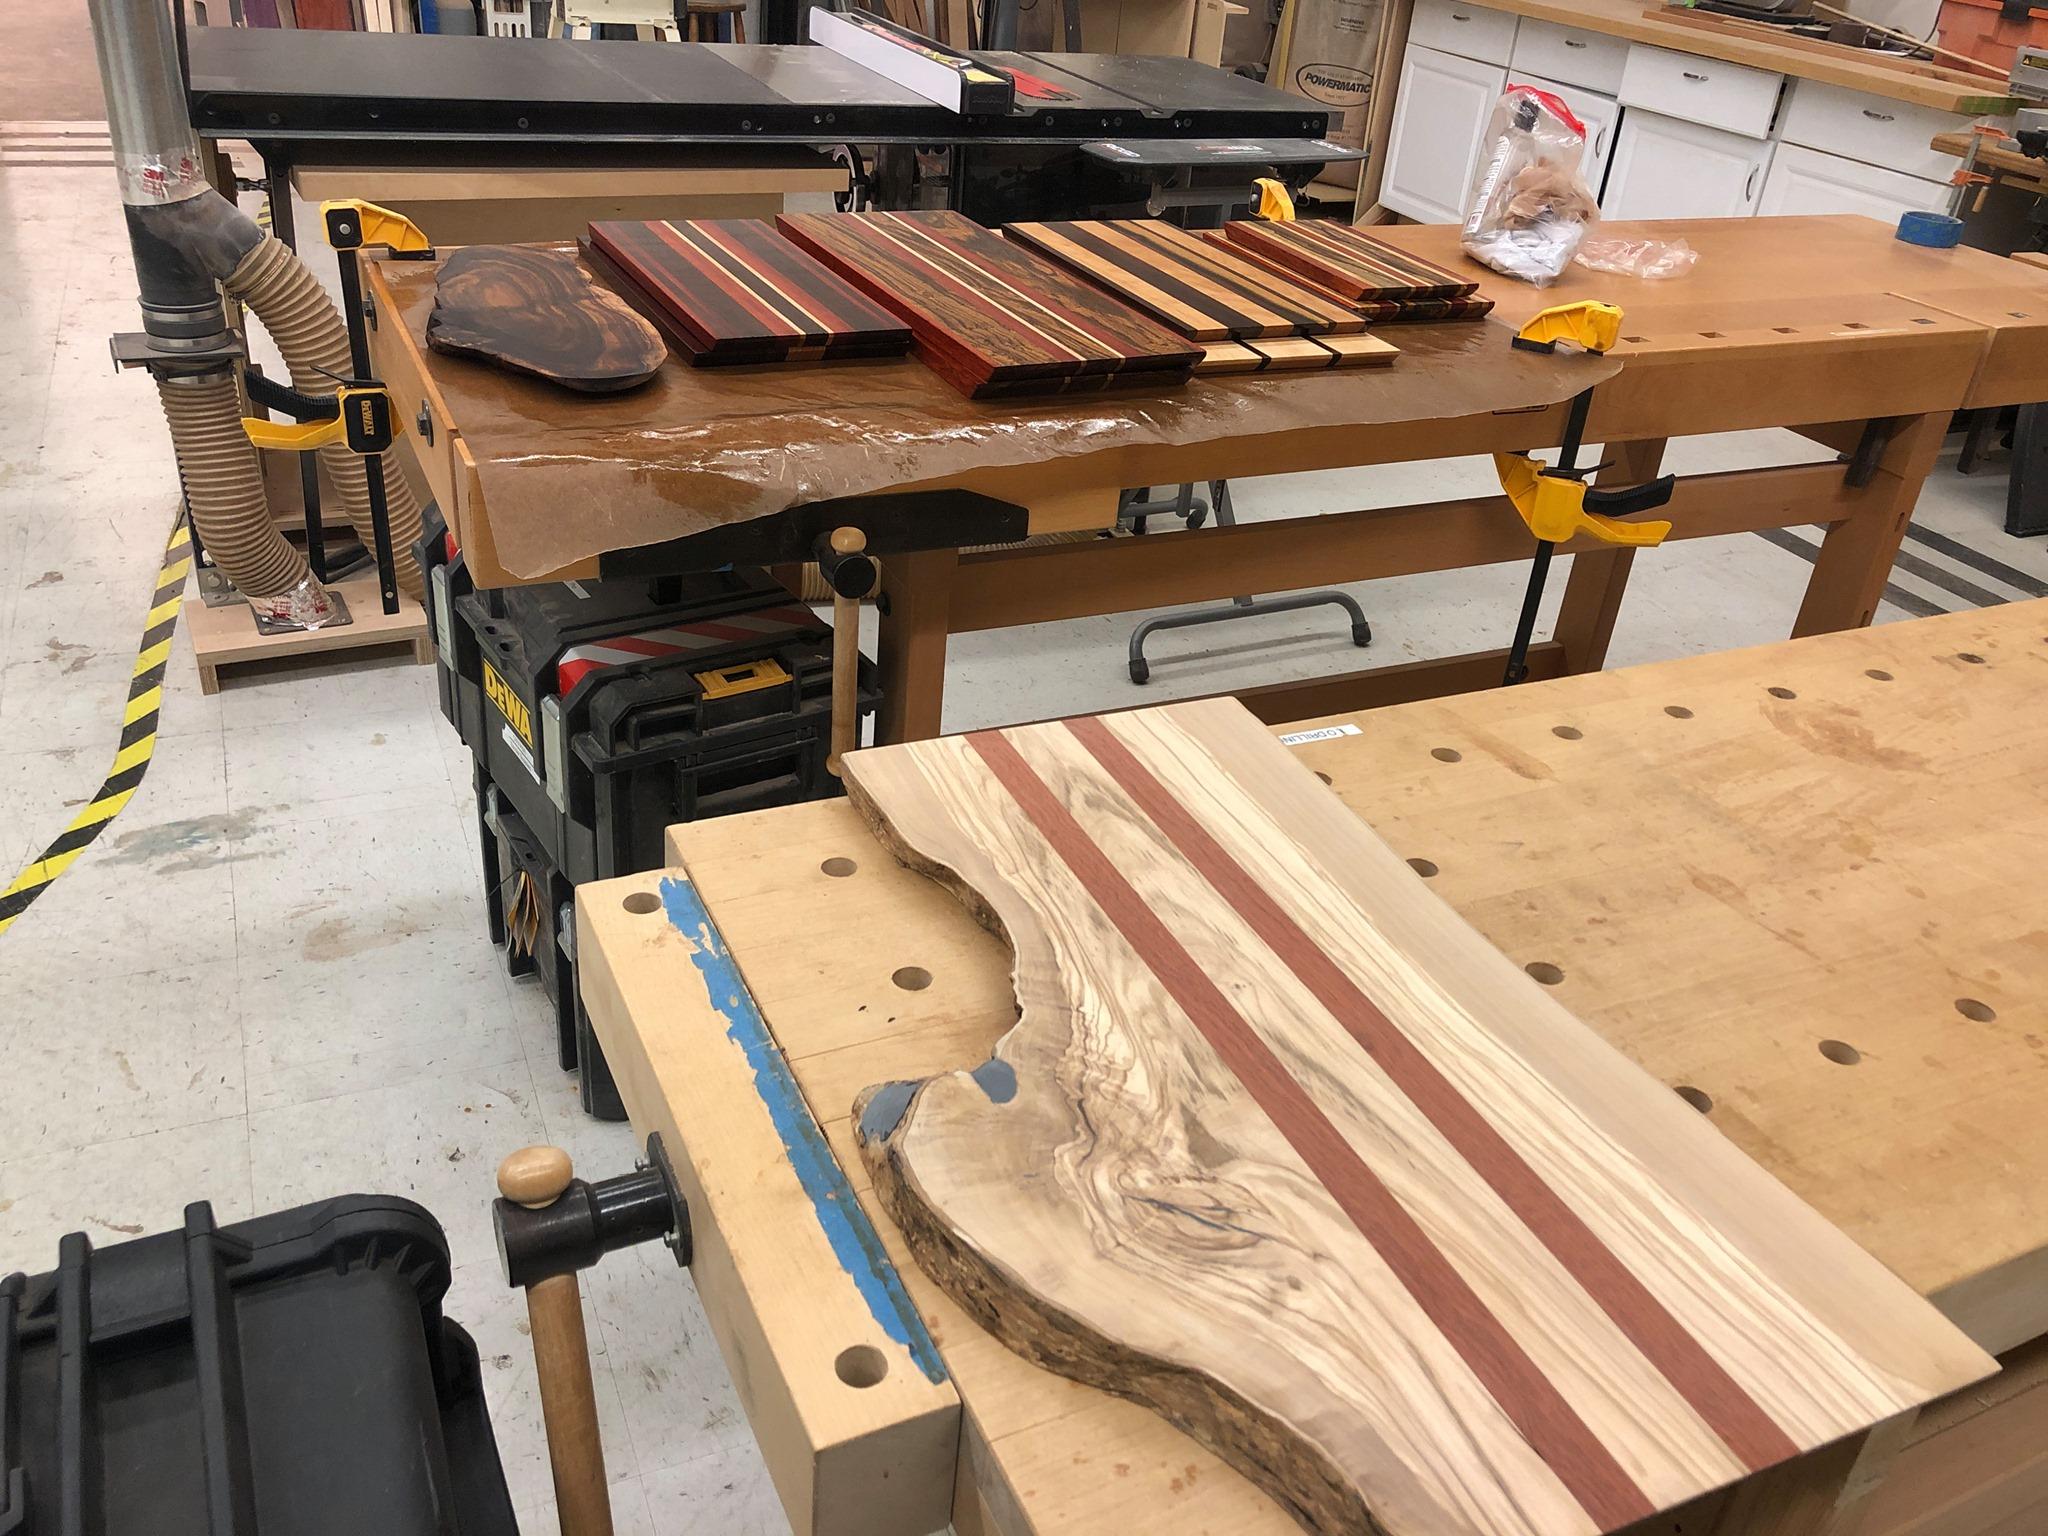 Woodshop projects